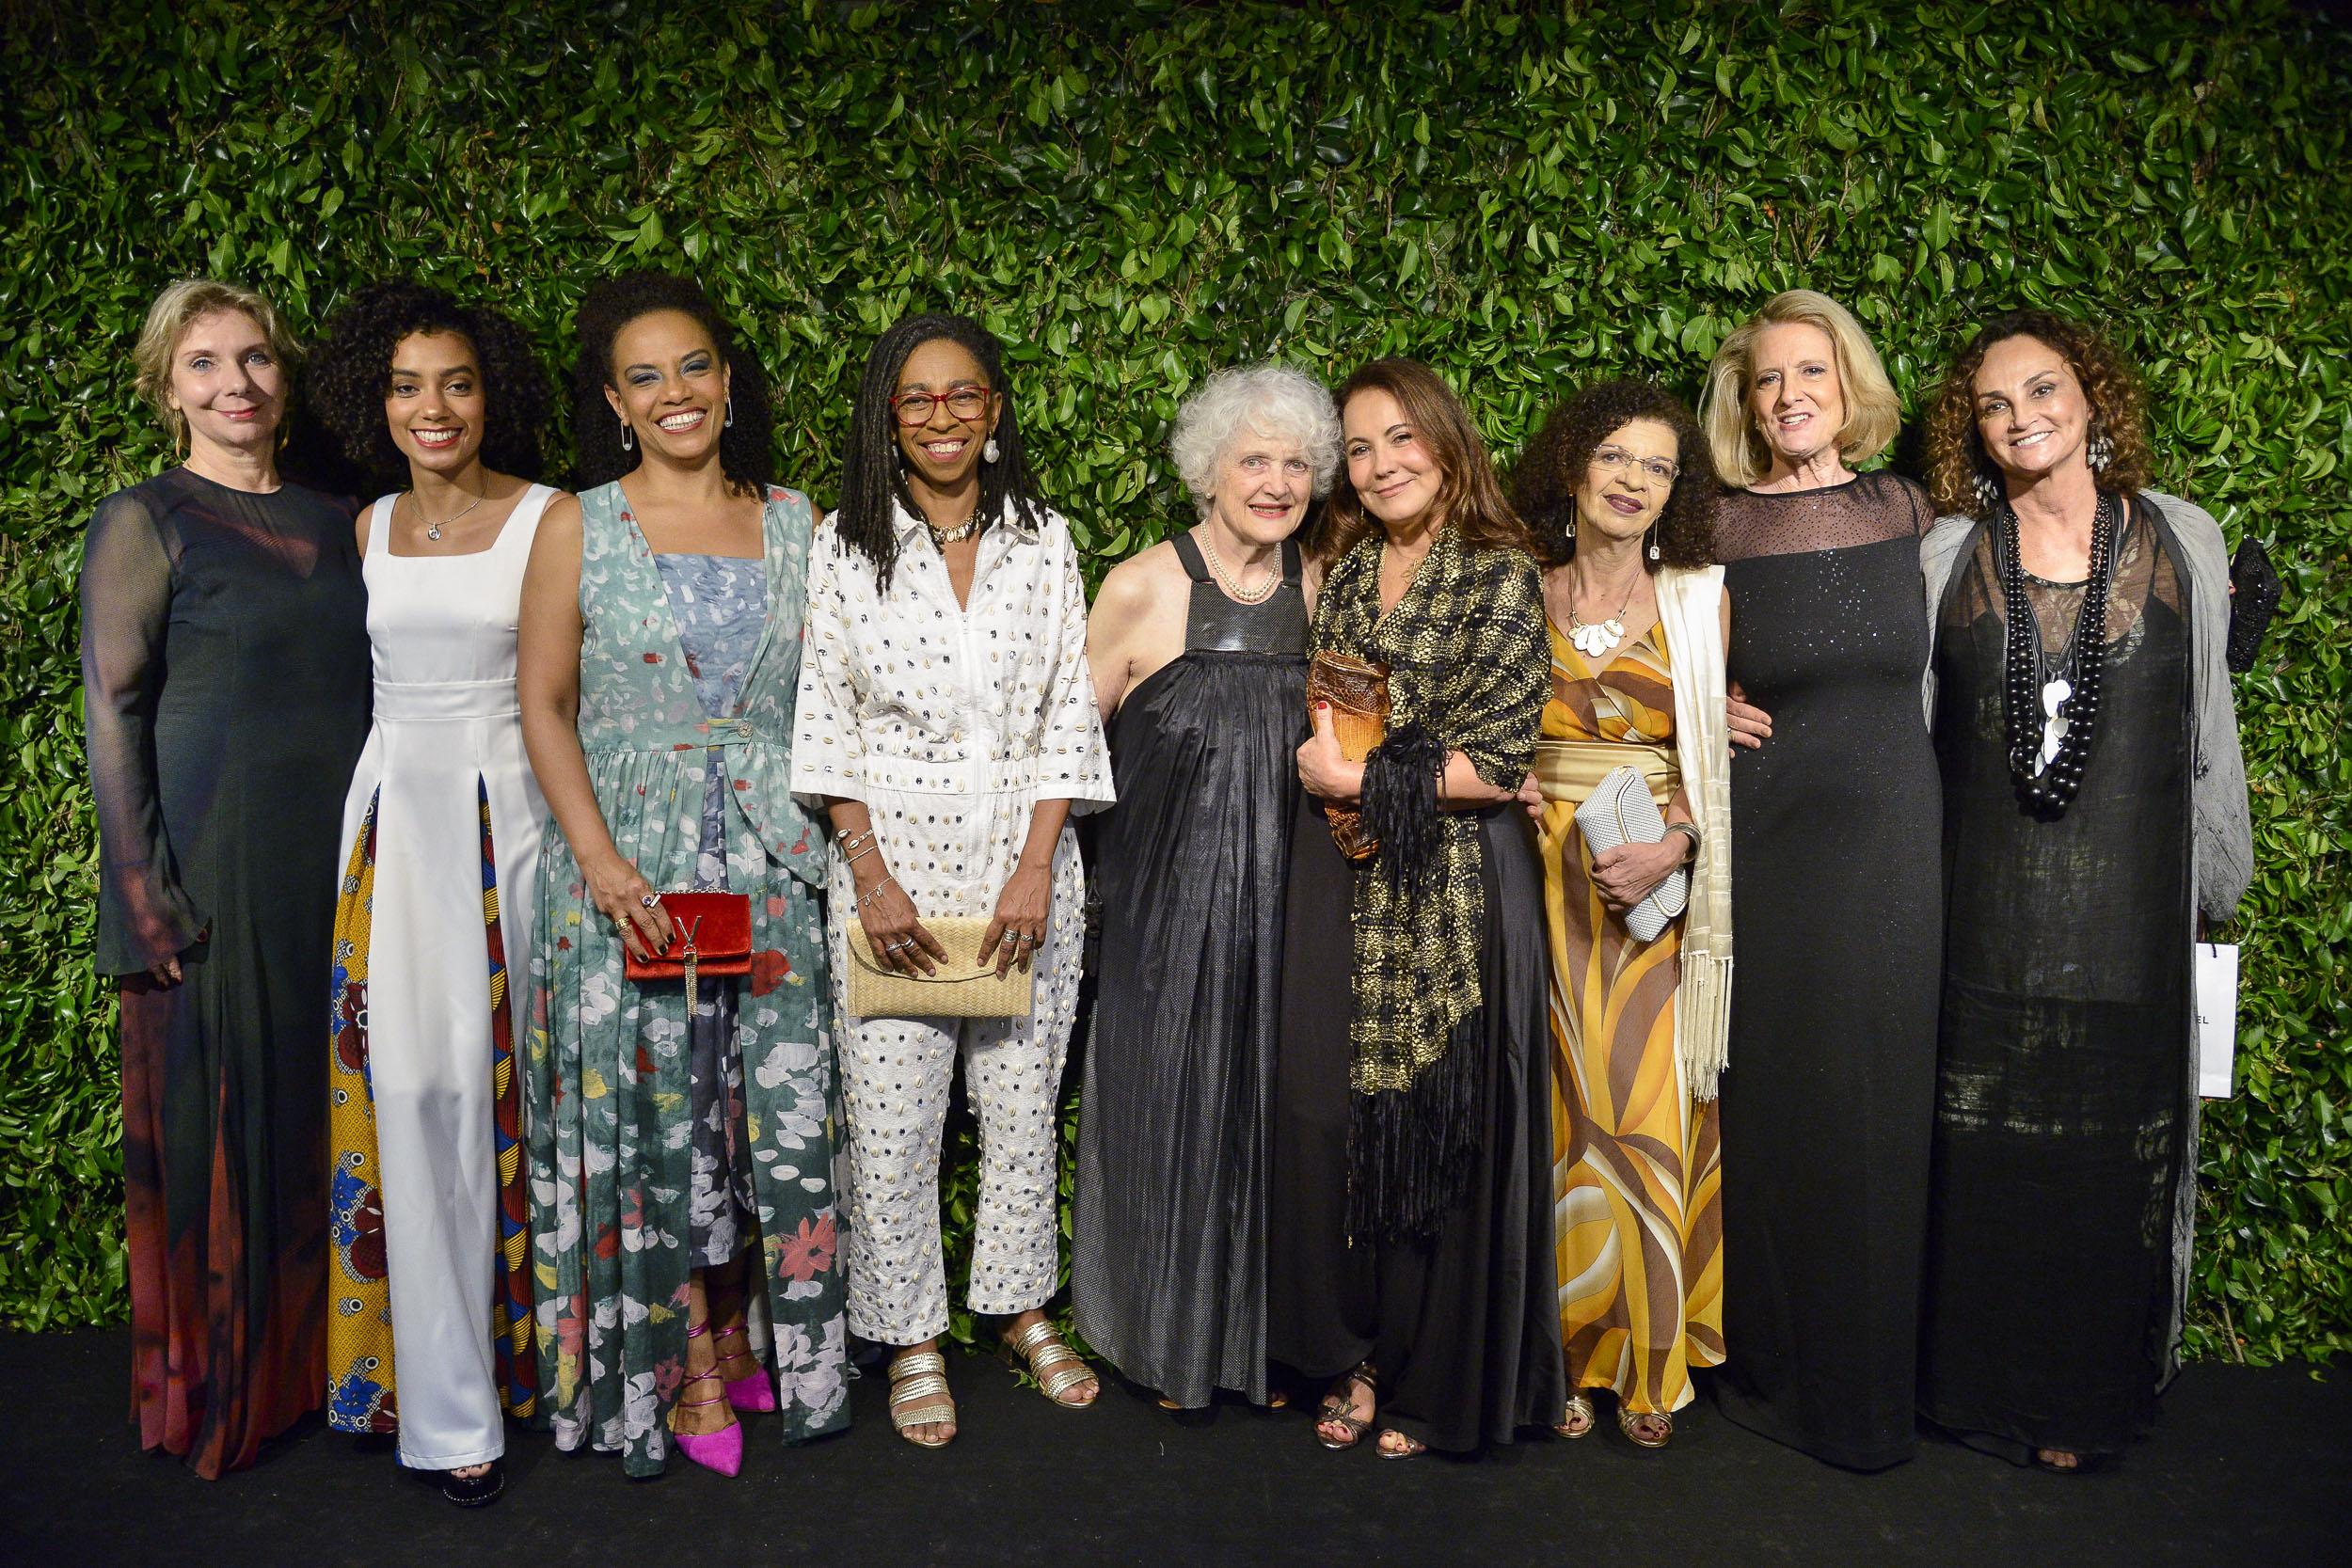 Mulheres Notáveis Rebecca Reichmann tavares, Leona Forman, BrazilFoundation Gala São Paulo Mulheres Notáveis Women Philanthropy Filantropia